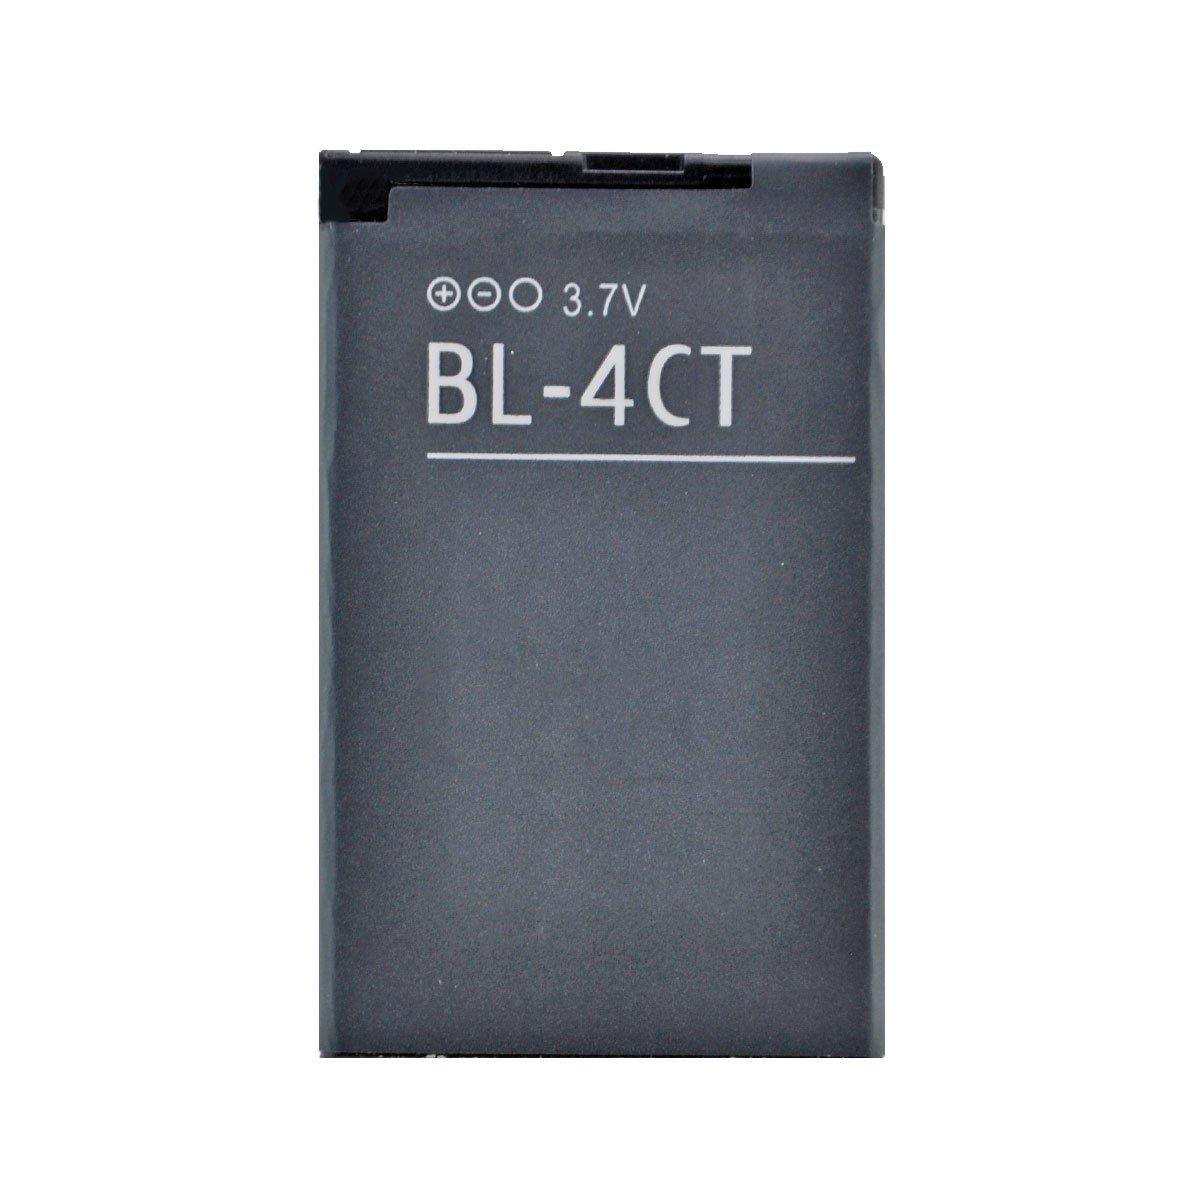 Аккумуляторная батарея для Nokia 5310 BL-4CT